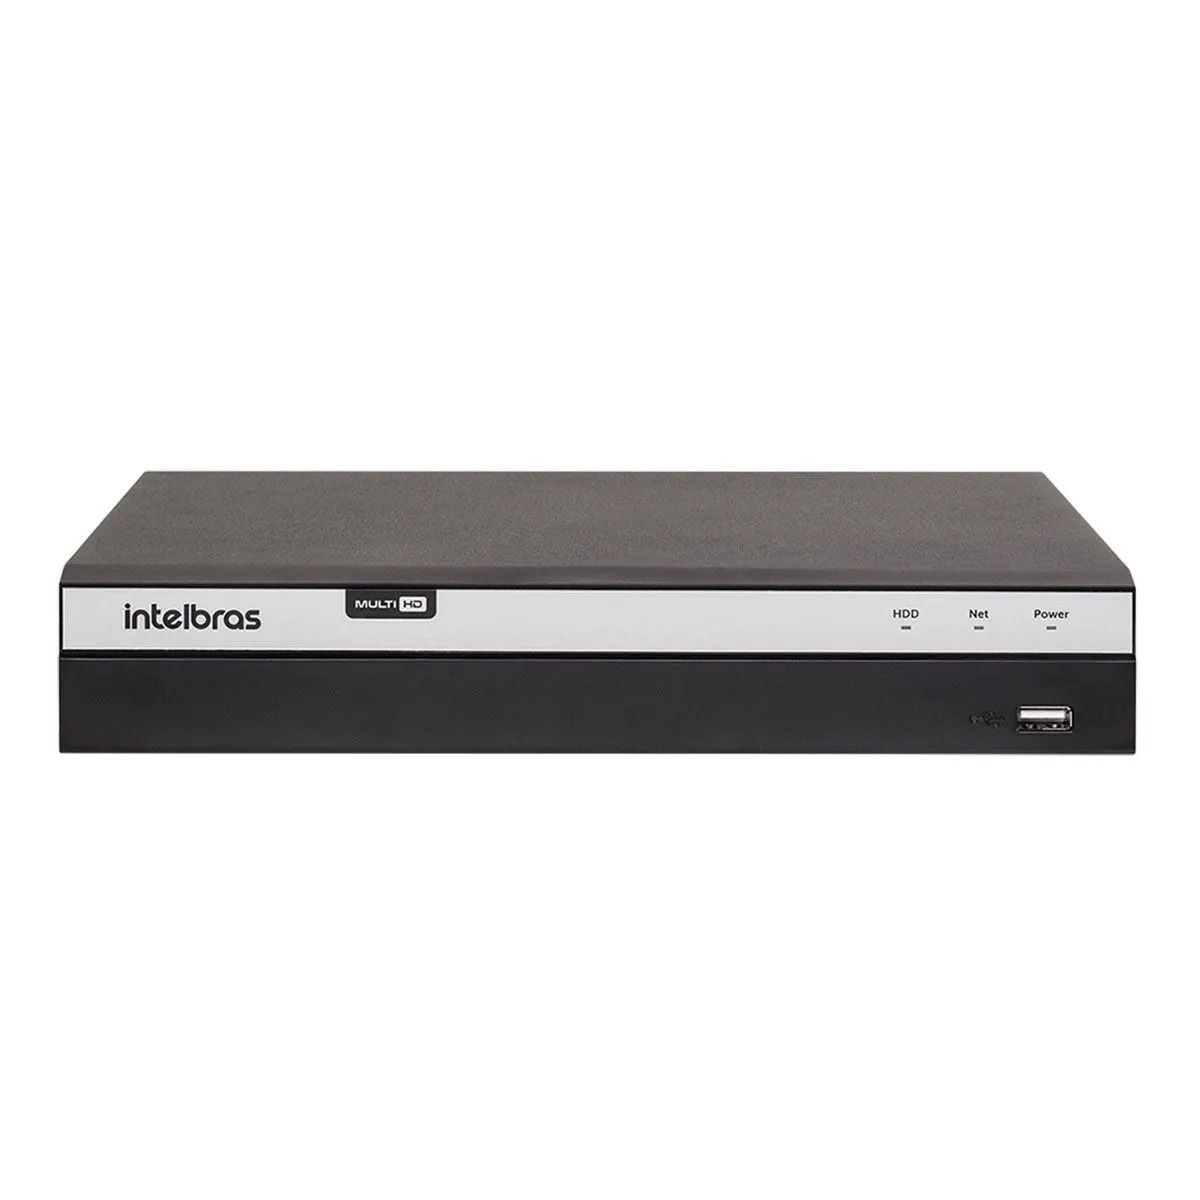 DVR- GRAVADOR DIGITAL 08 CANAIS MHDX 3108 - INTELBRAS